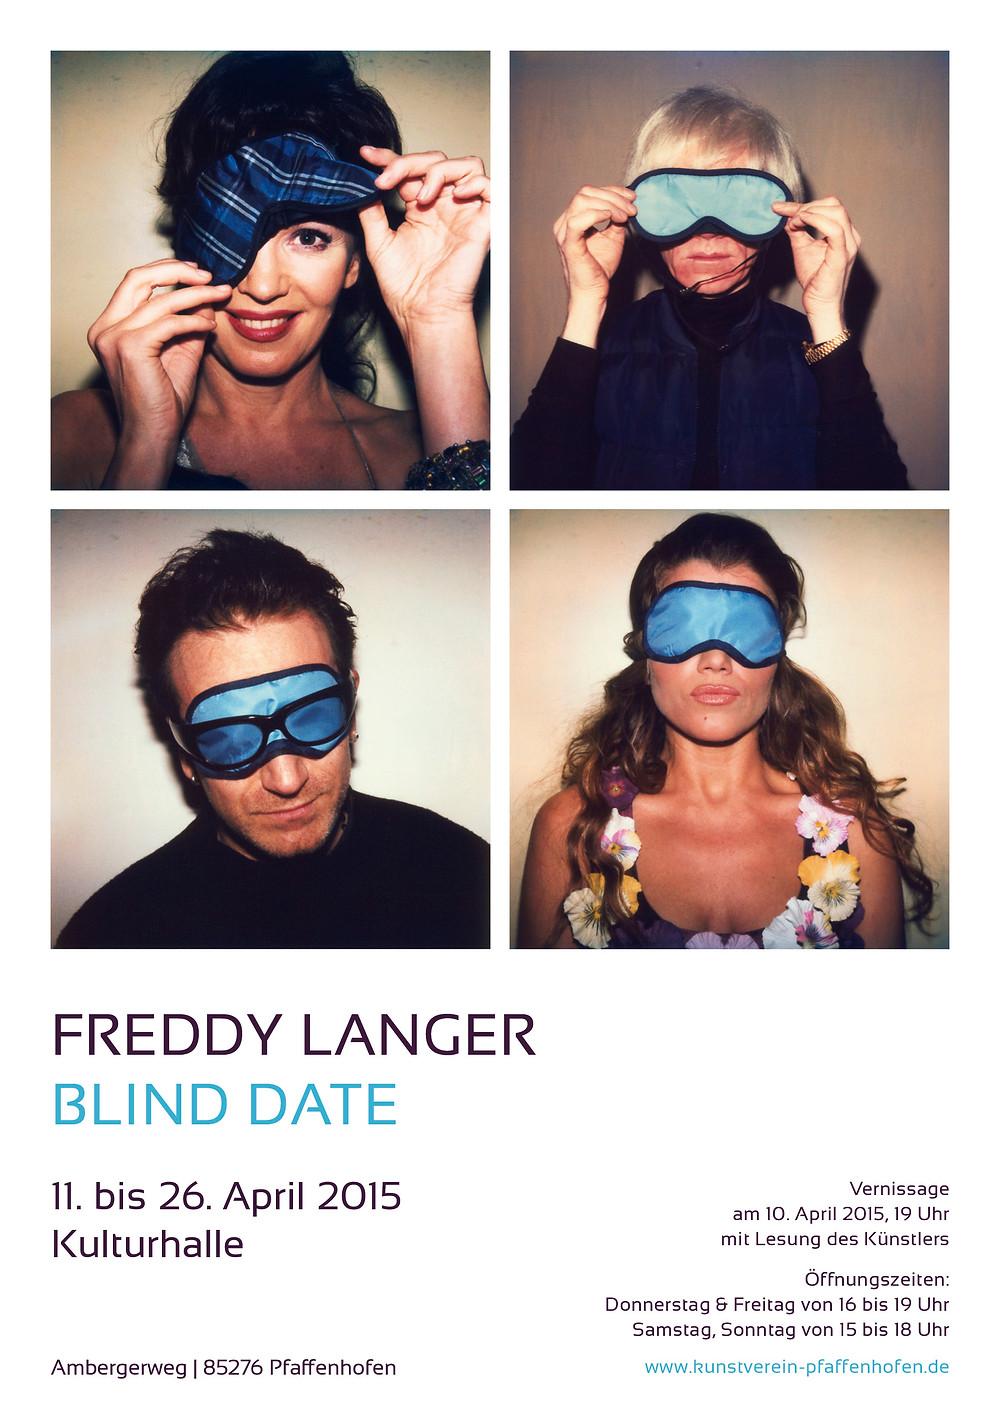 Freddy Langer